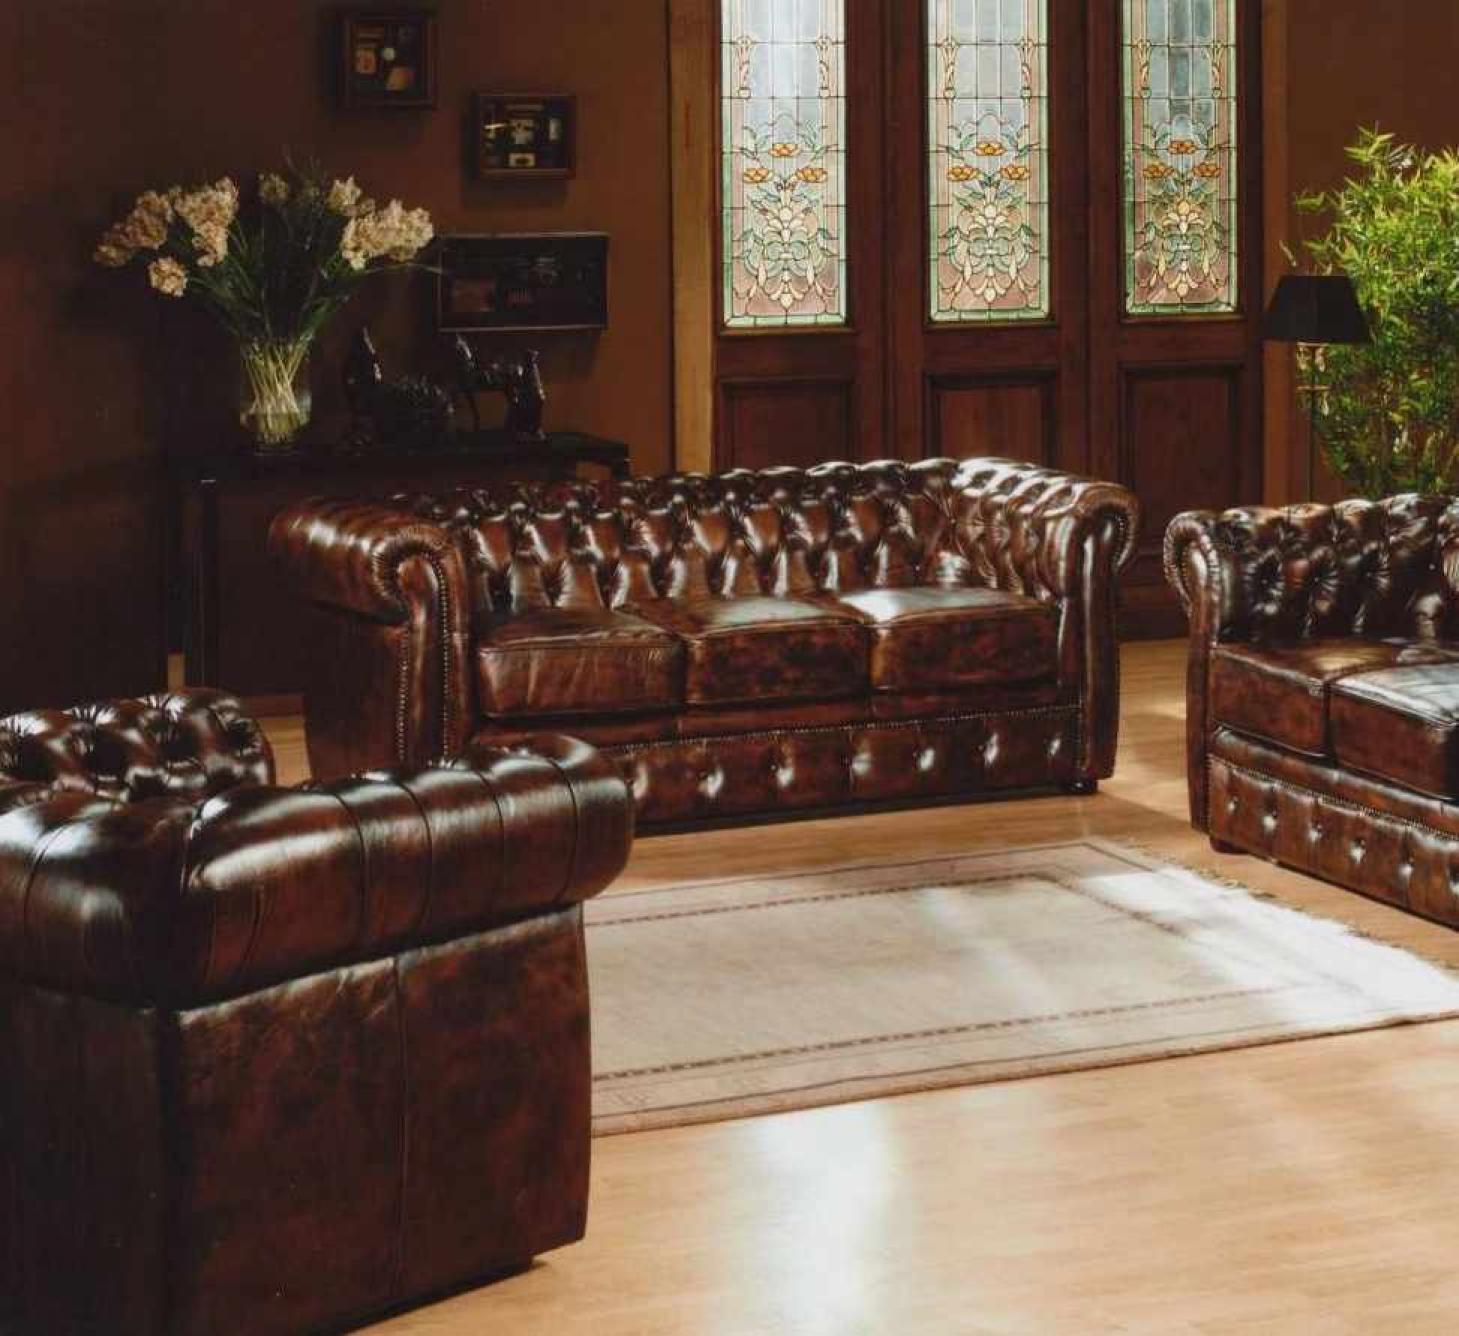 belle le bon coin salon de jardin d occasion id es de salon de jardin. Black Bedroom Furniture Sets. Home Design Ideas